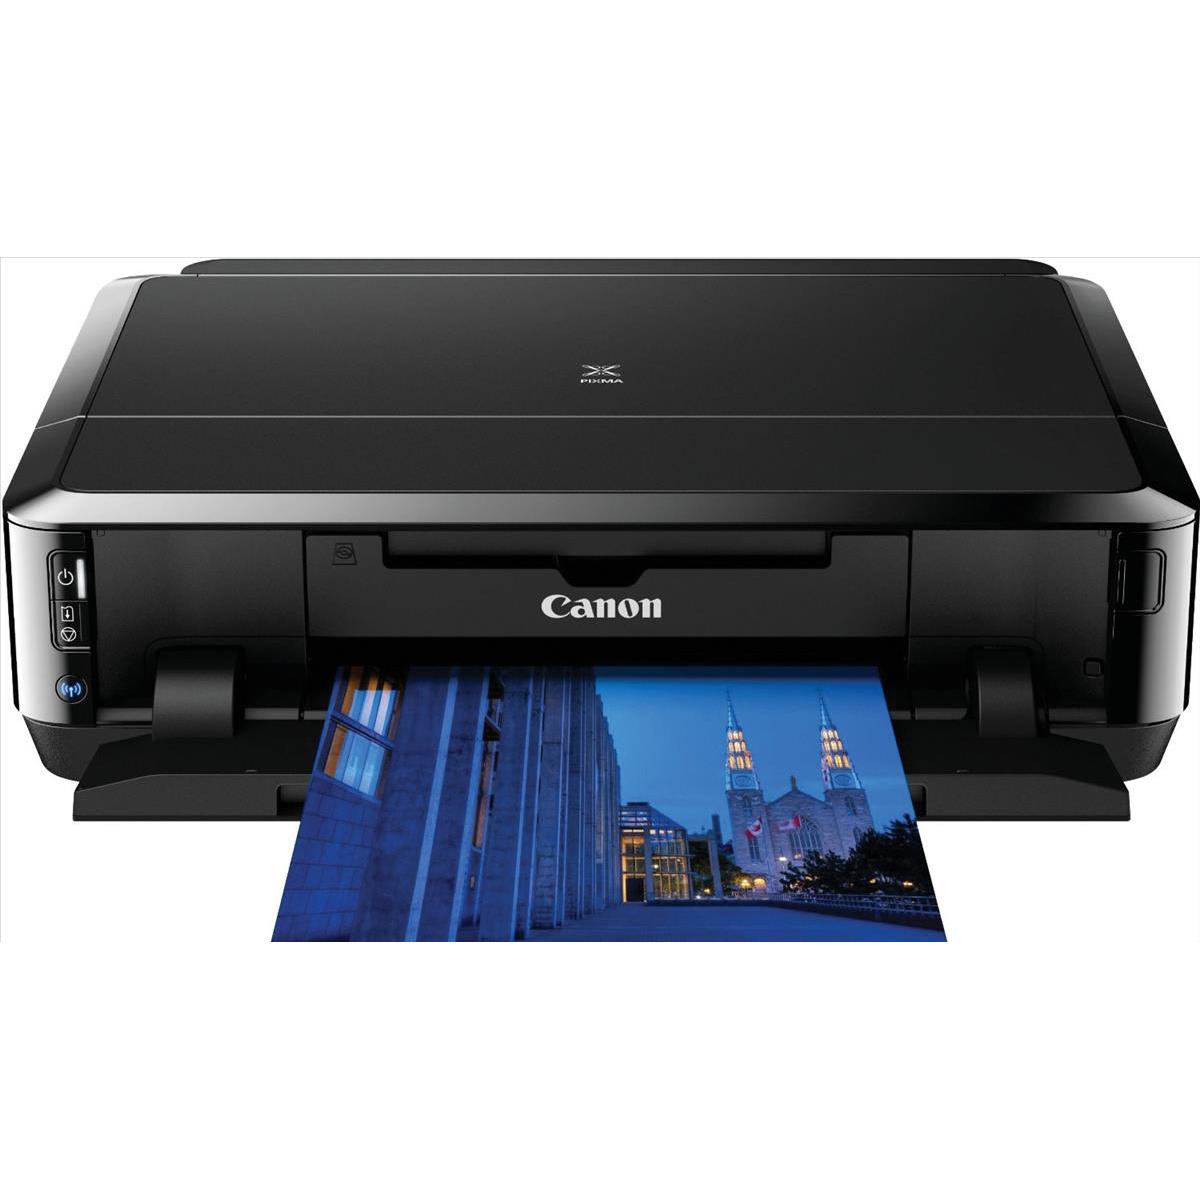 Canon Pixma iP7250 Colour A4 Inkjet Printer Ref CANIP7250